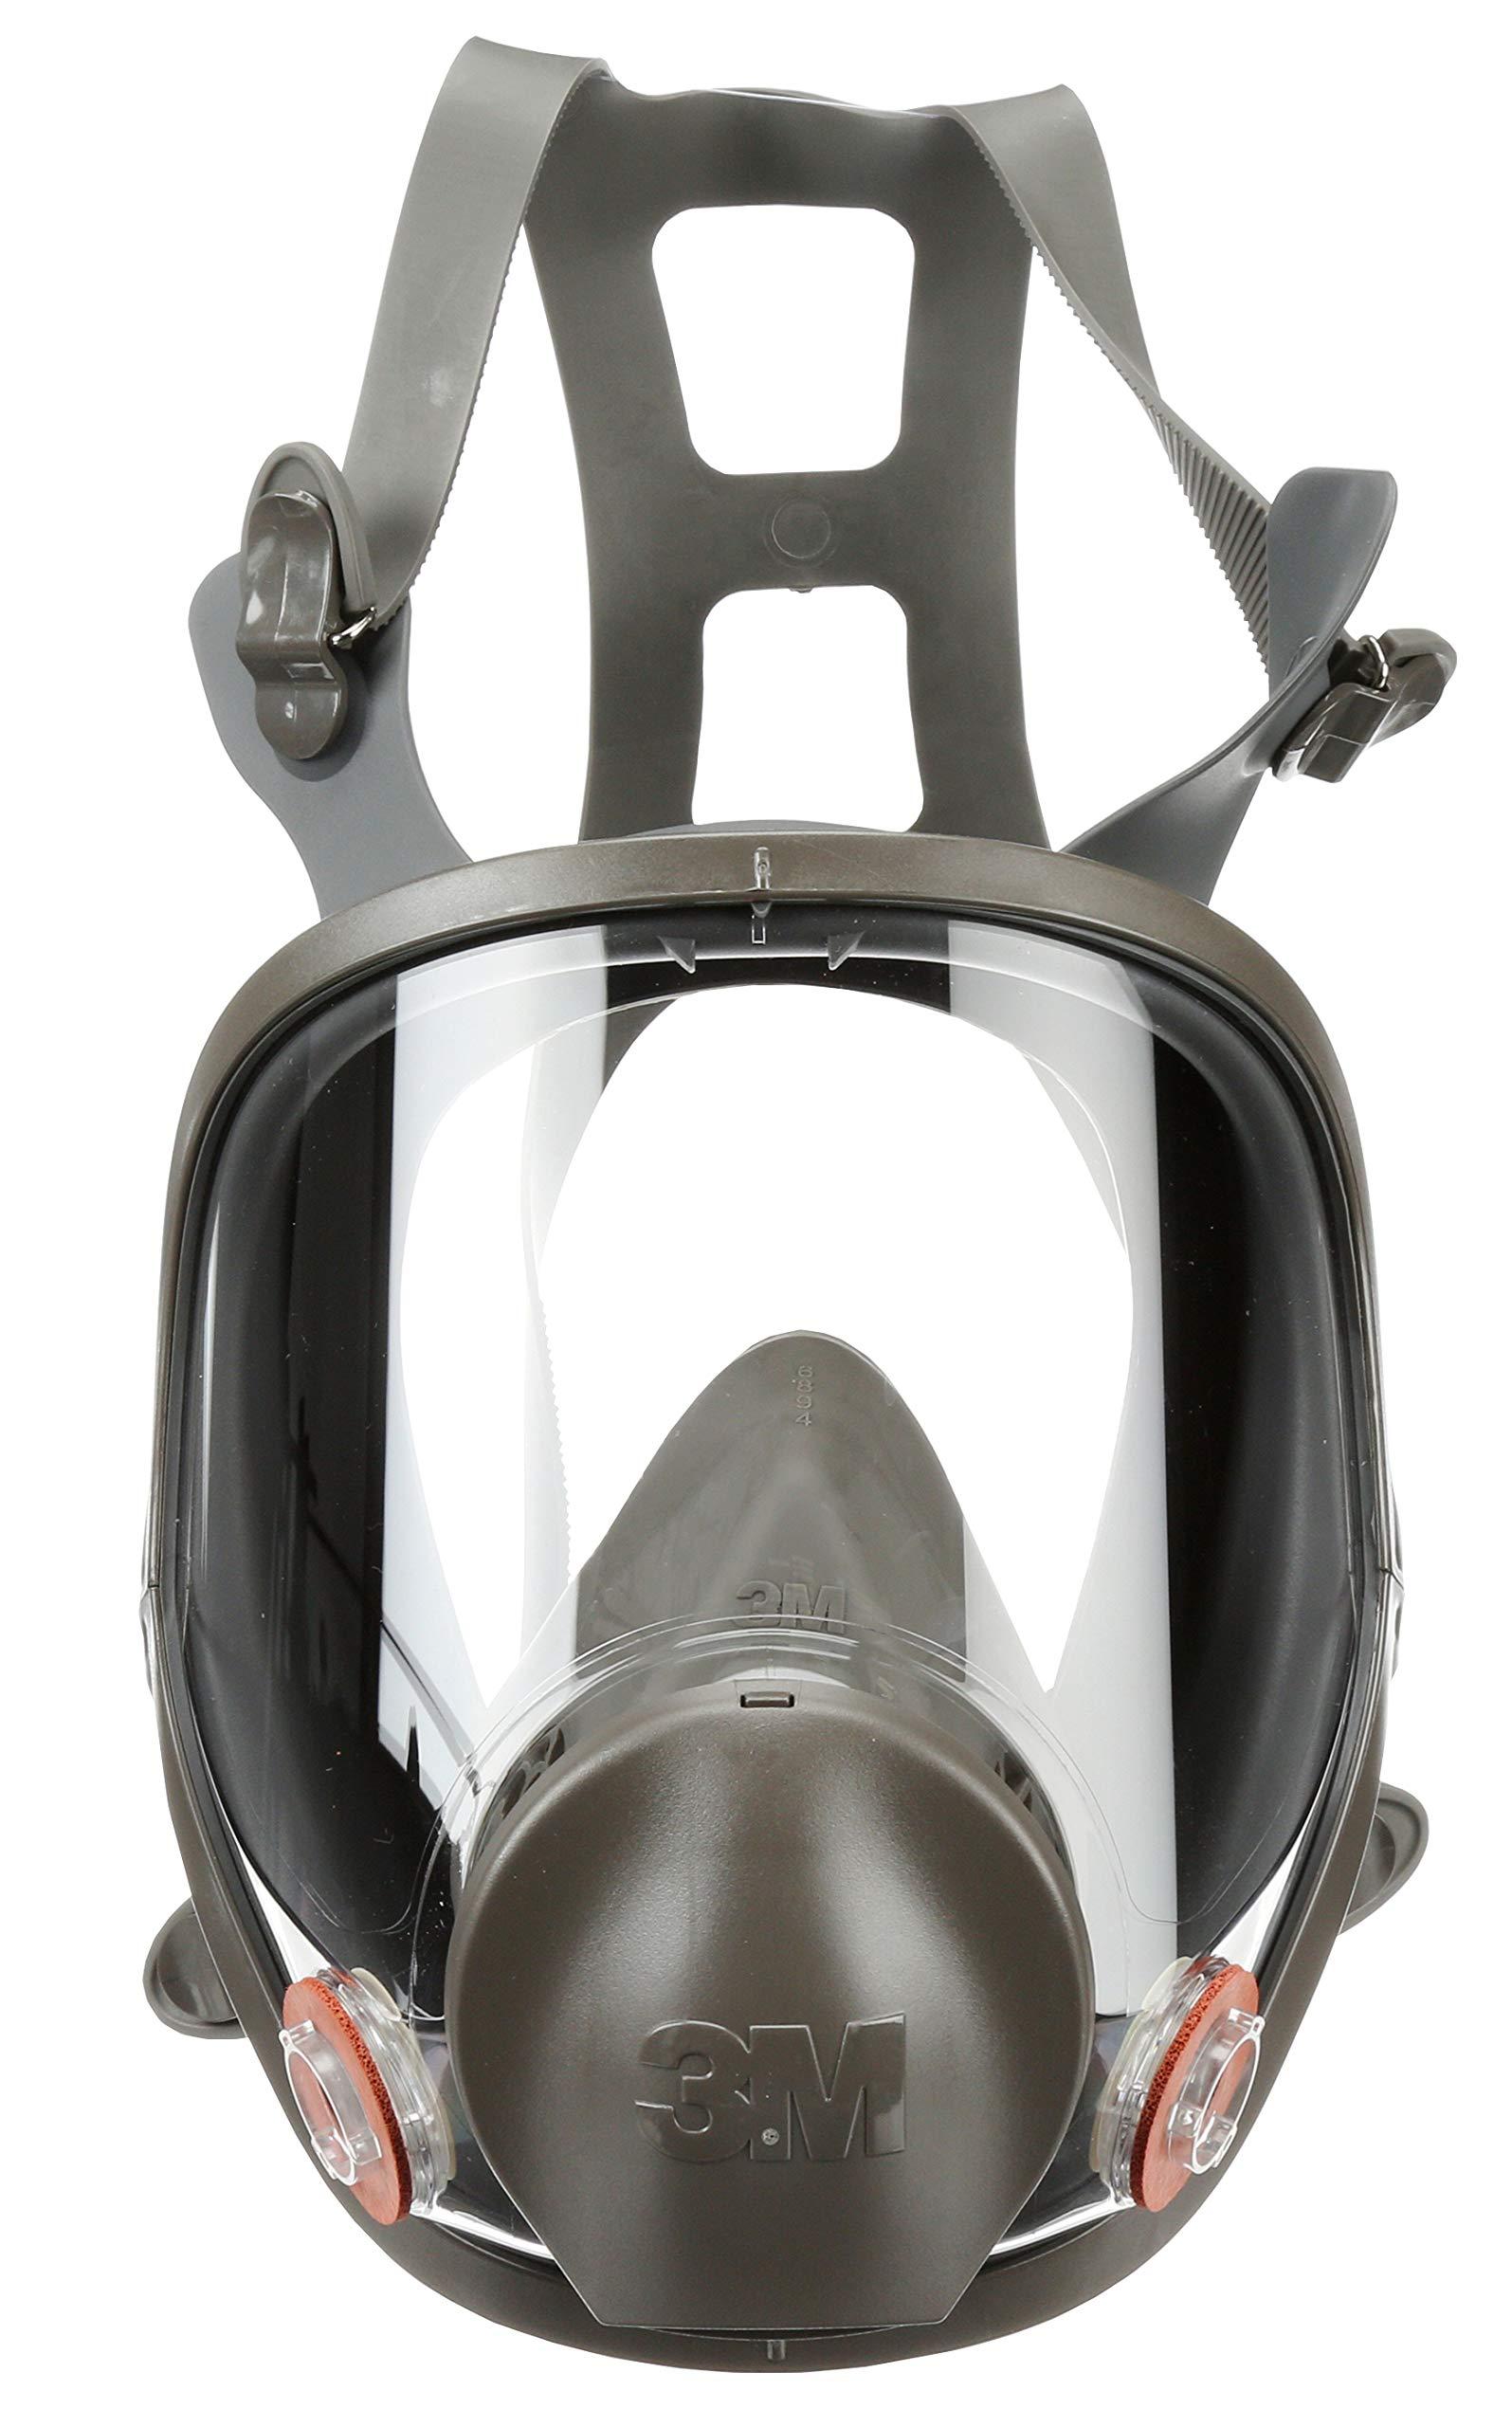 3M Full Facepiece Reusable Respirator 6900, Paint Vapors, Dust, Mold, Chemicals, Large